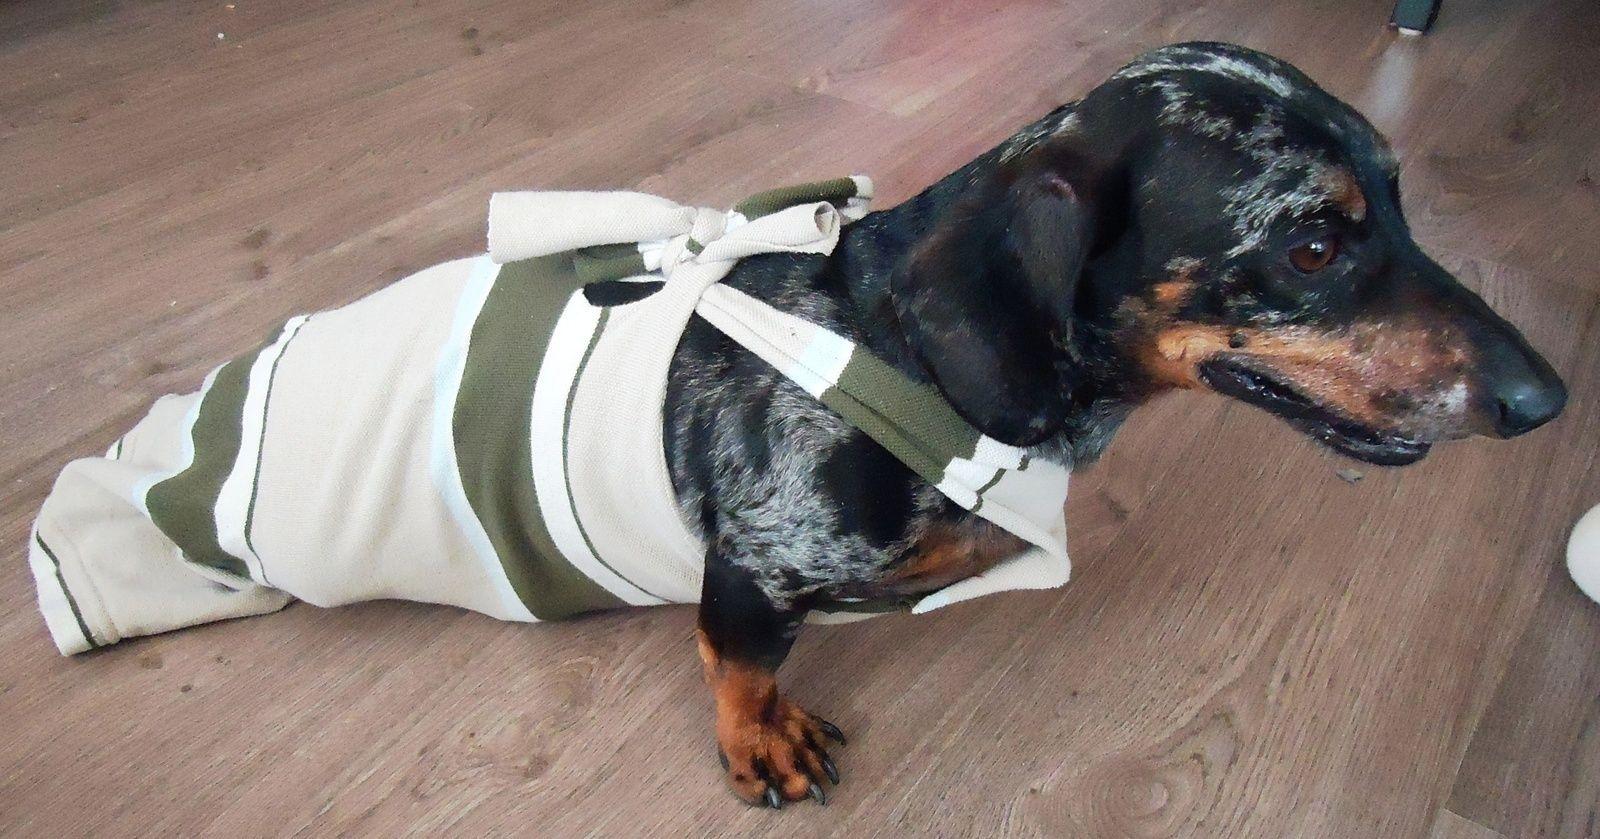 Paralyzed Weiner Dog Drag Bag Paralyzed Dog Dog Wheelchair Dogs